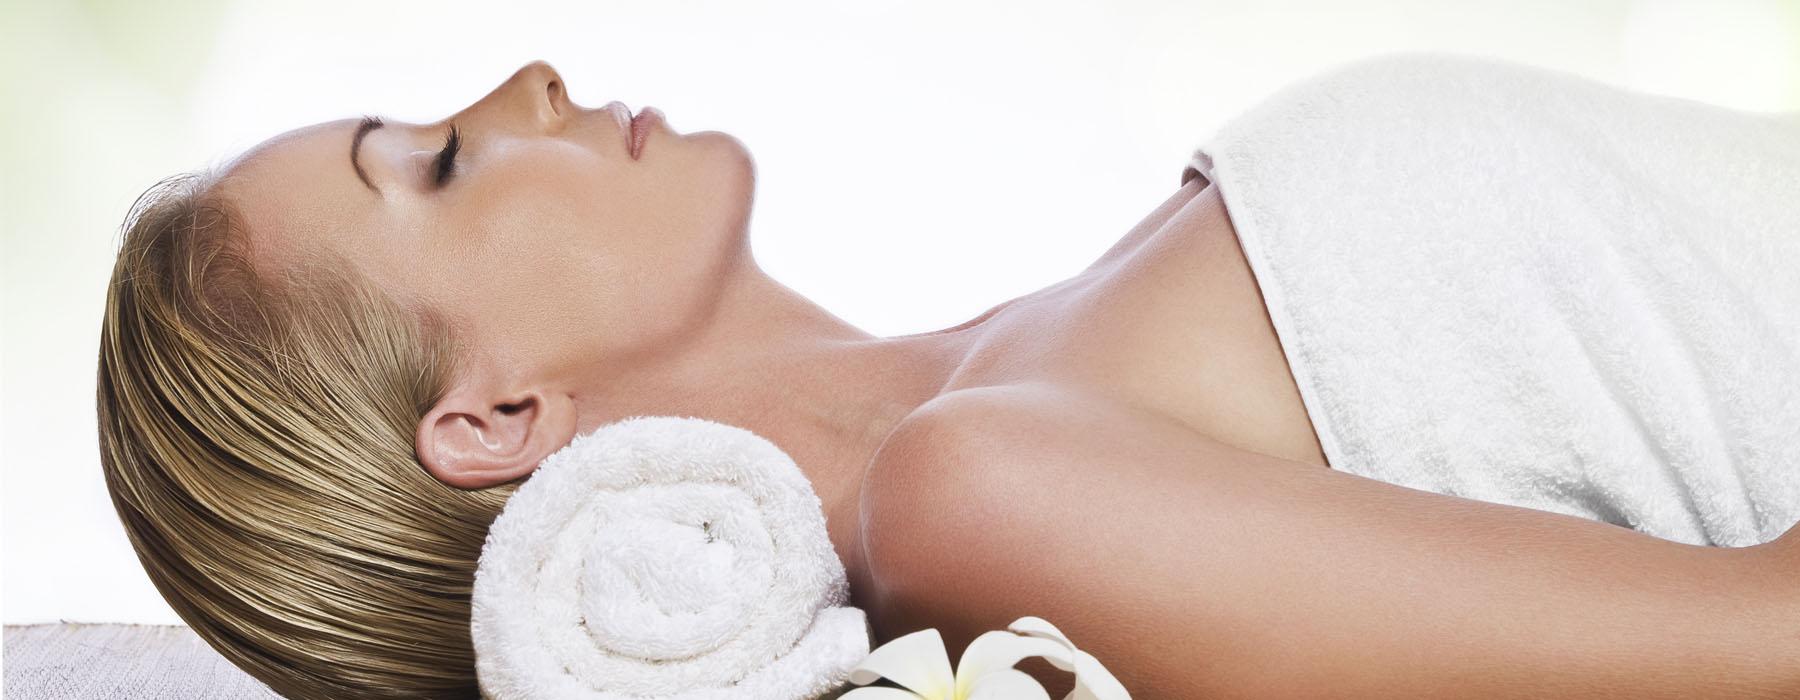 Bath with simple massage